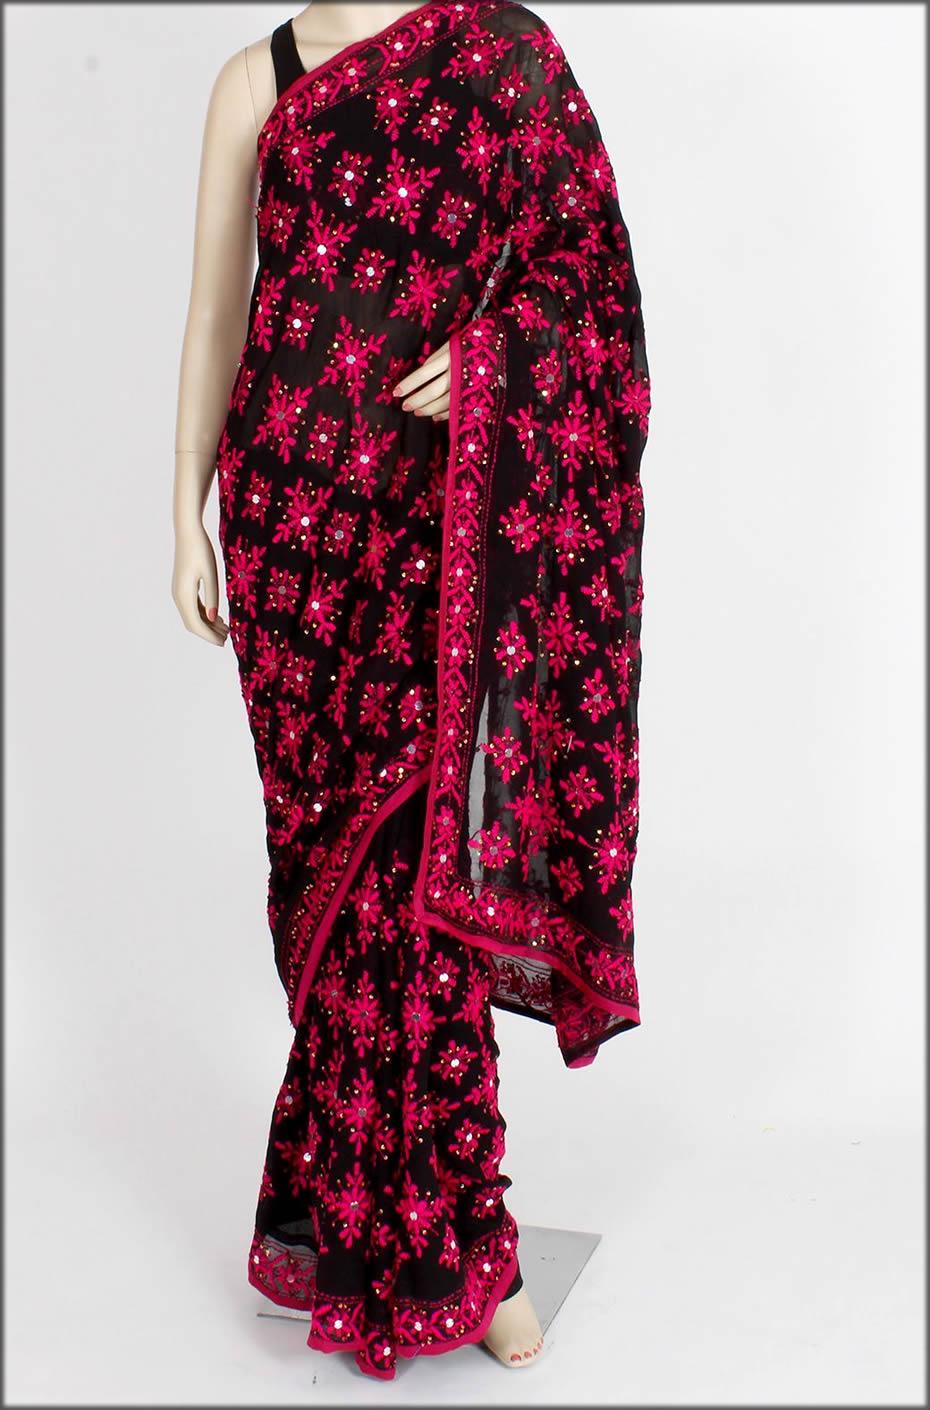 Handmade Black Phulkari Saree From Punjab